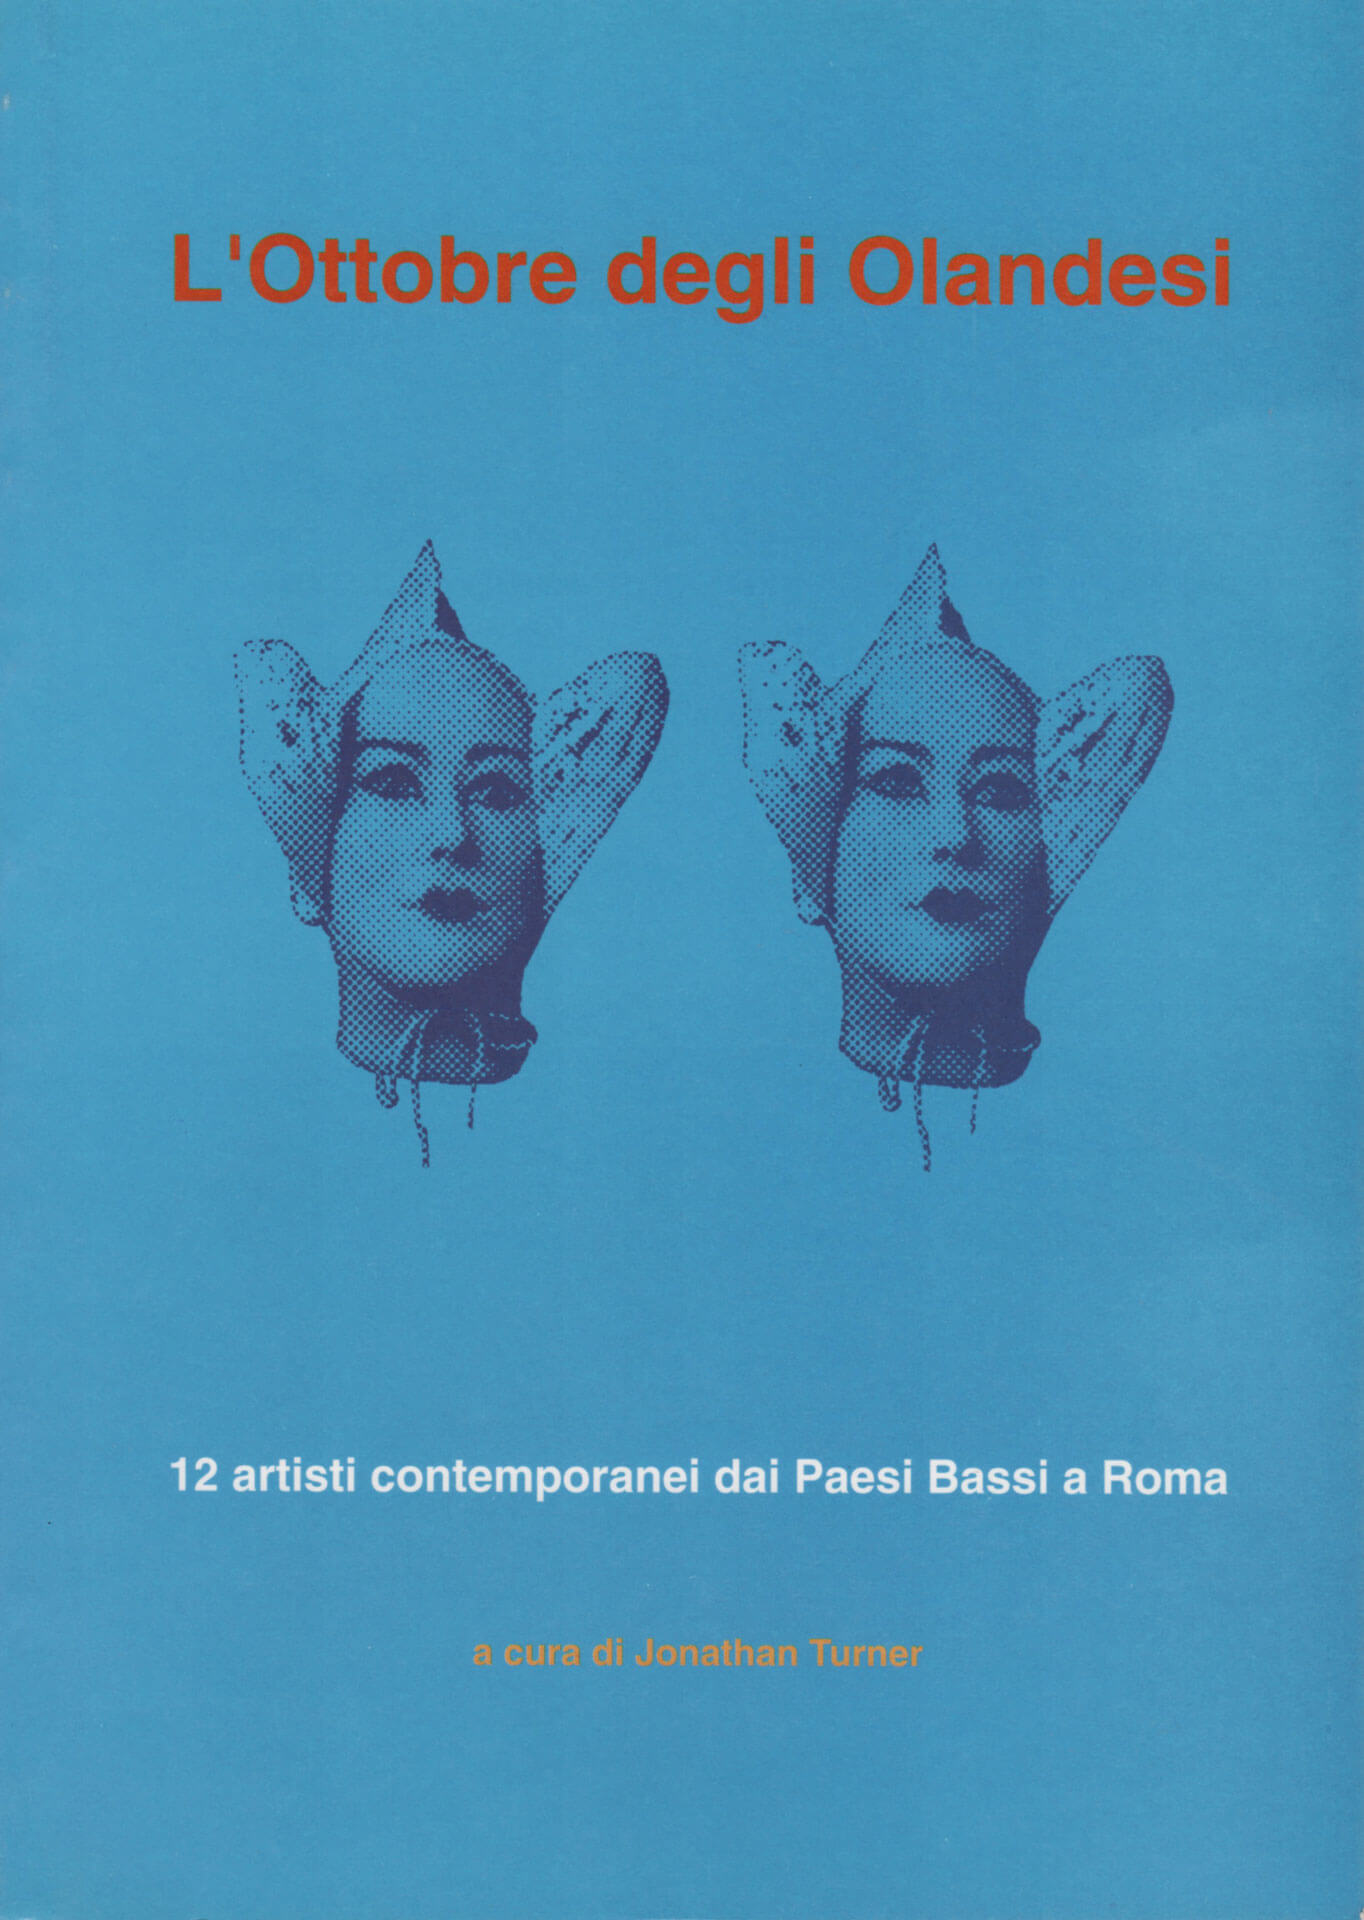 Studio Stefania Miscetti | Catalogues | Dirk Lansink | L'ottobre degli olandesi